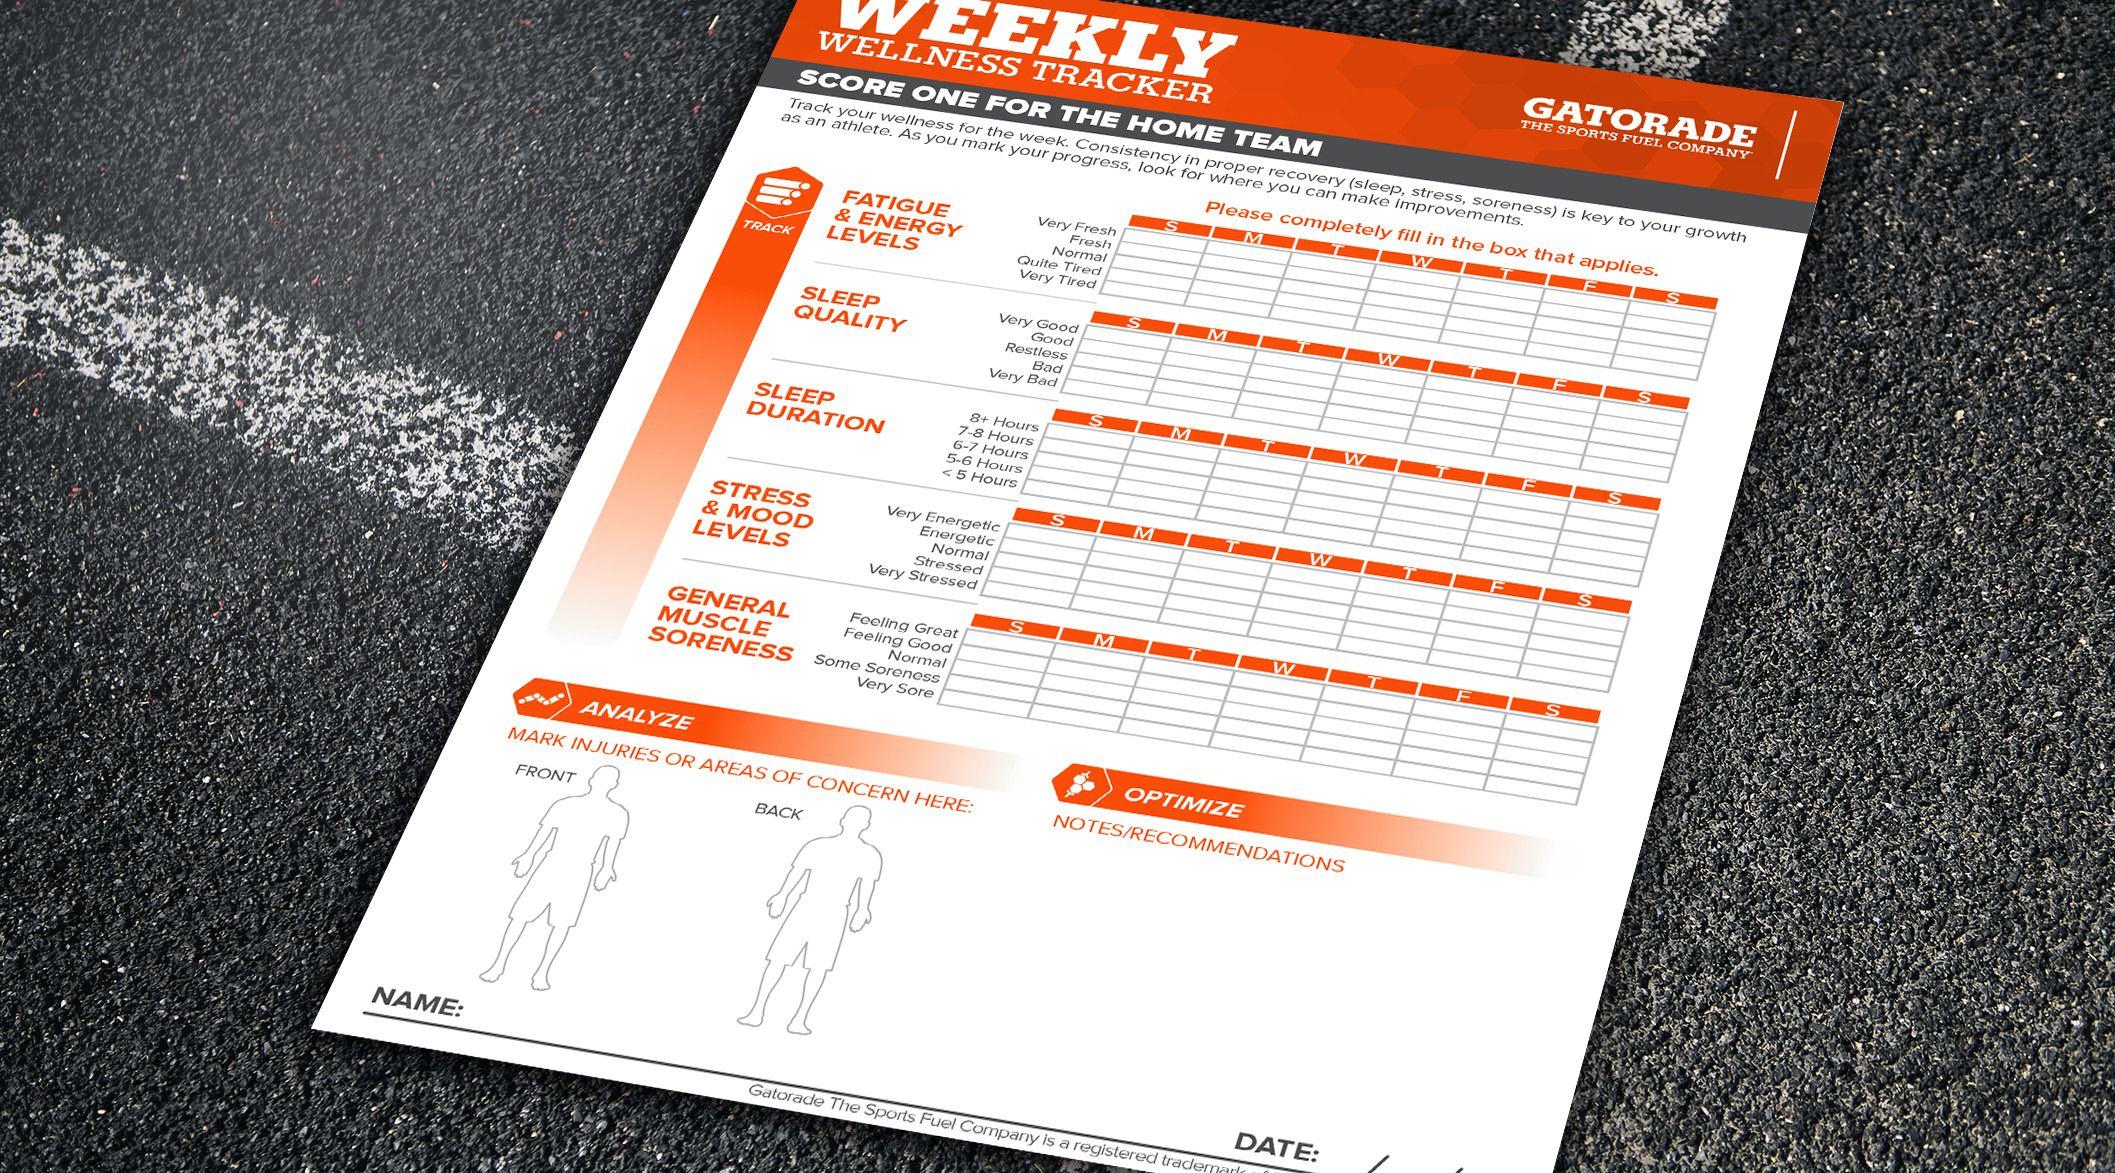 Wellness Tracker Weekly Worksheet